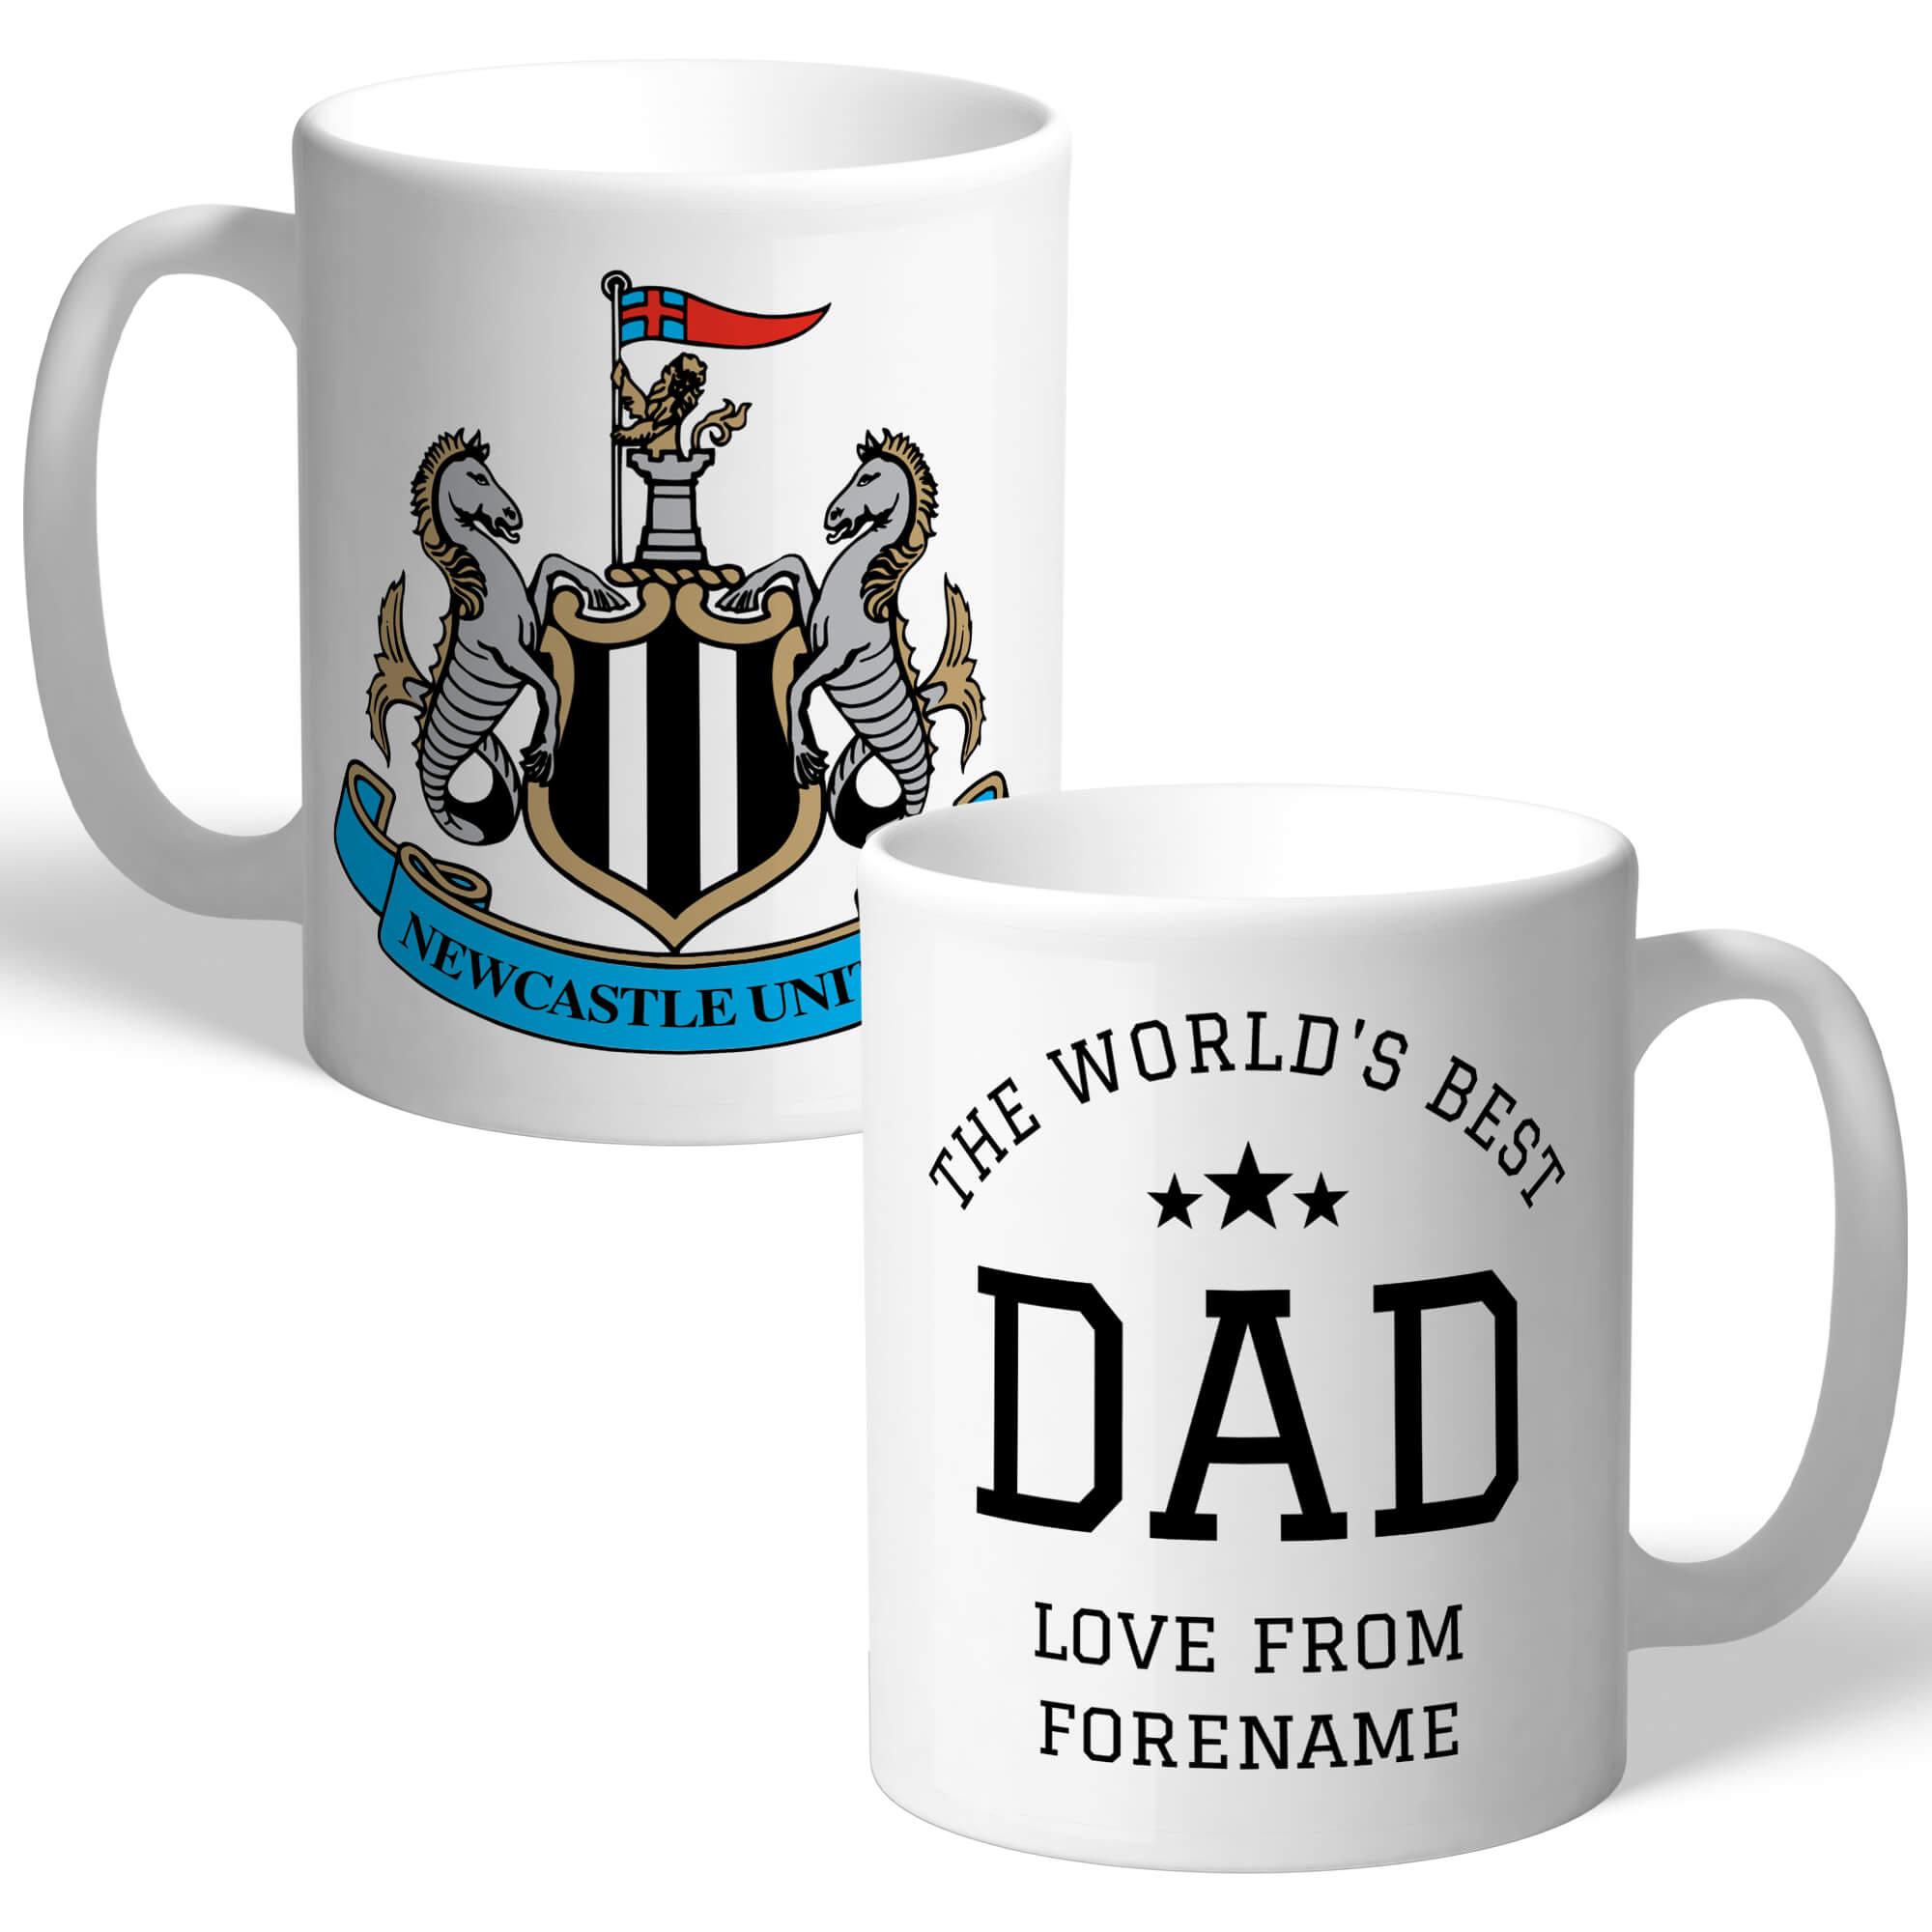 Newcastle United FC World's Best Dad Mug